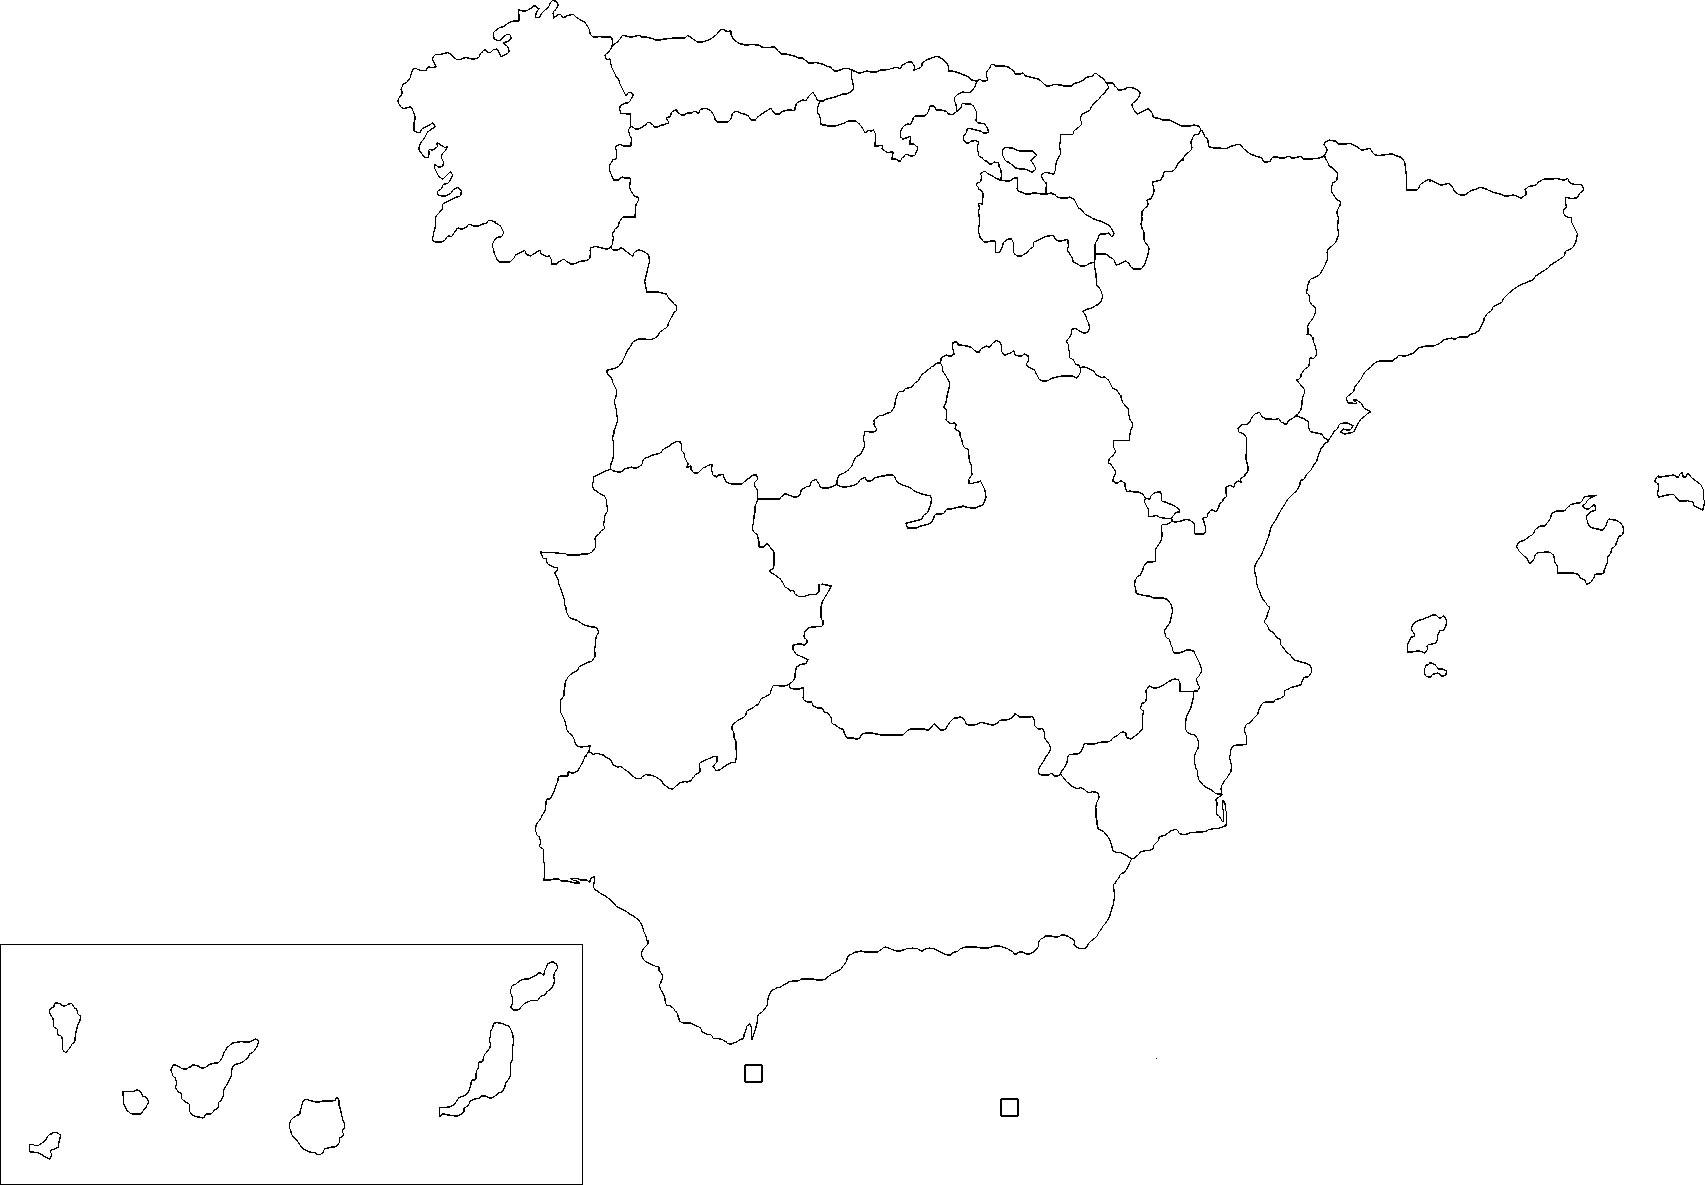 Carte Espagne Vierge Régions, Carte Vierge Des Régions De L dedans Carte Des Régions Vierge